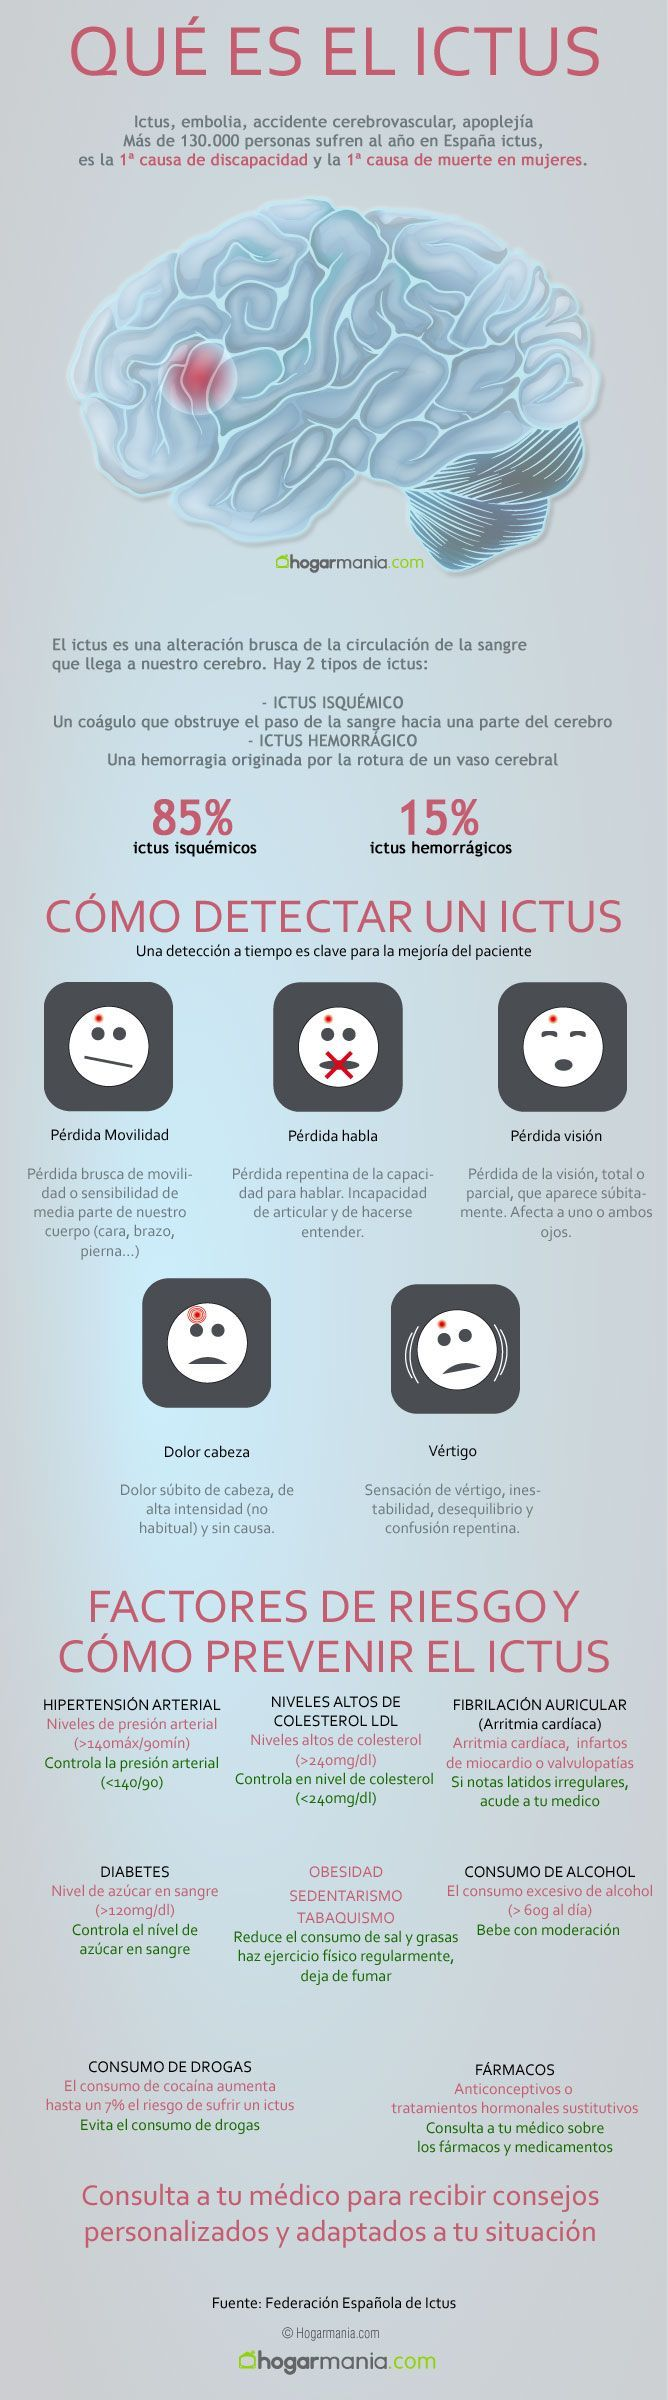 infografia ictus